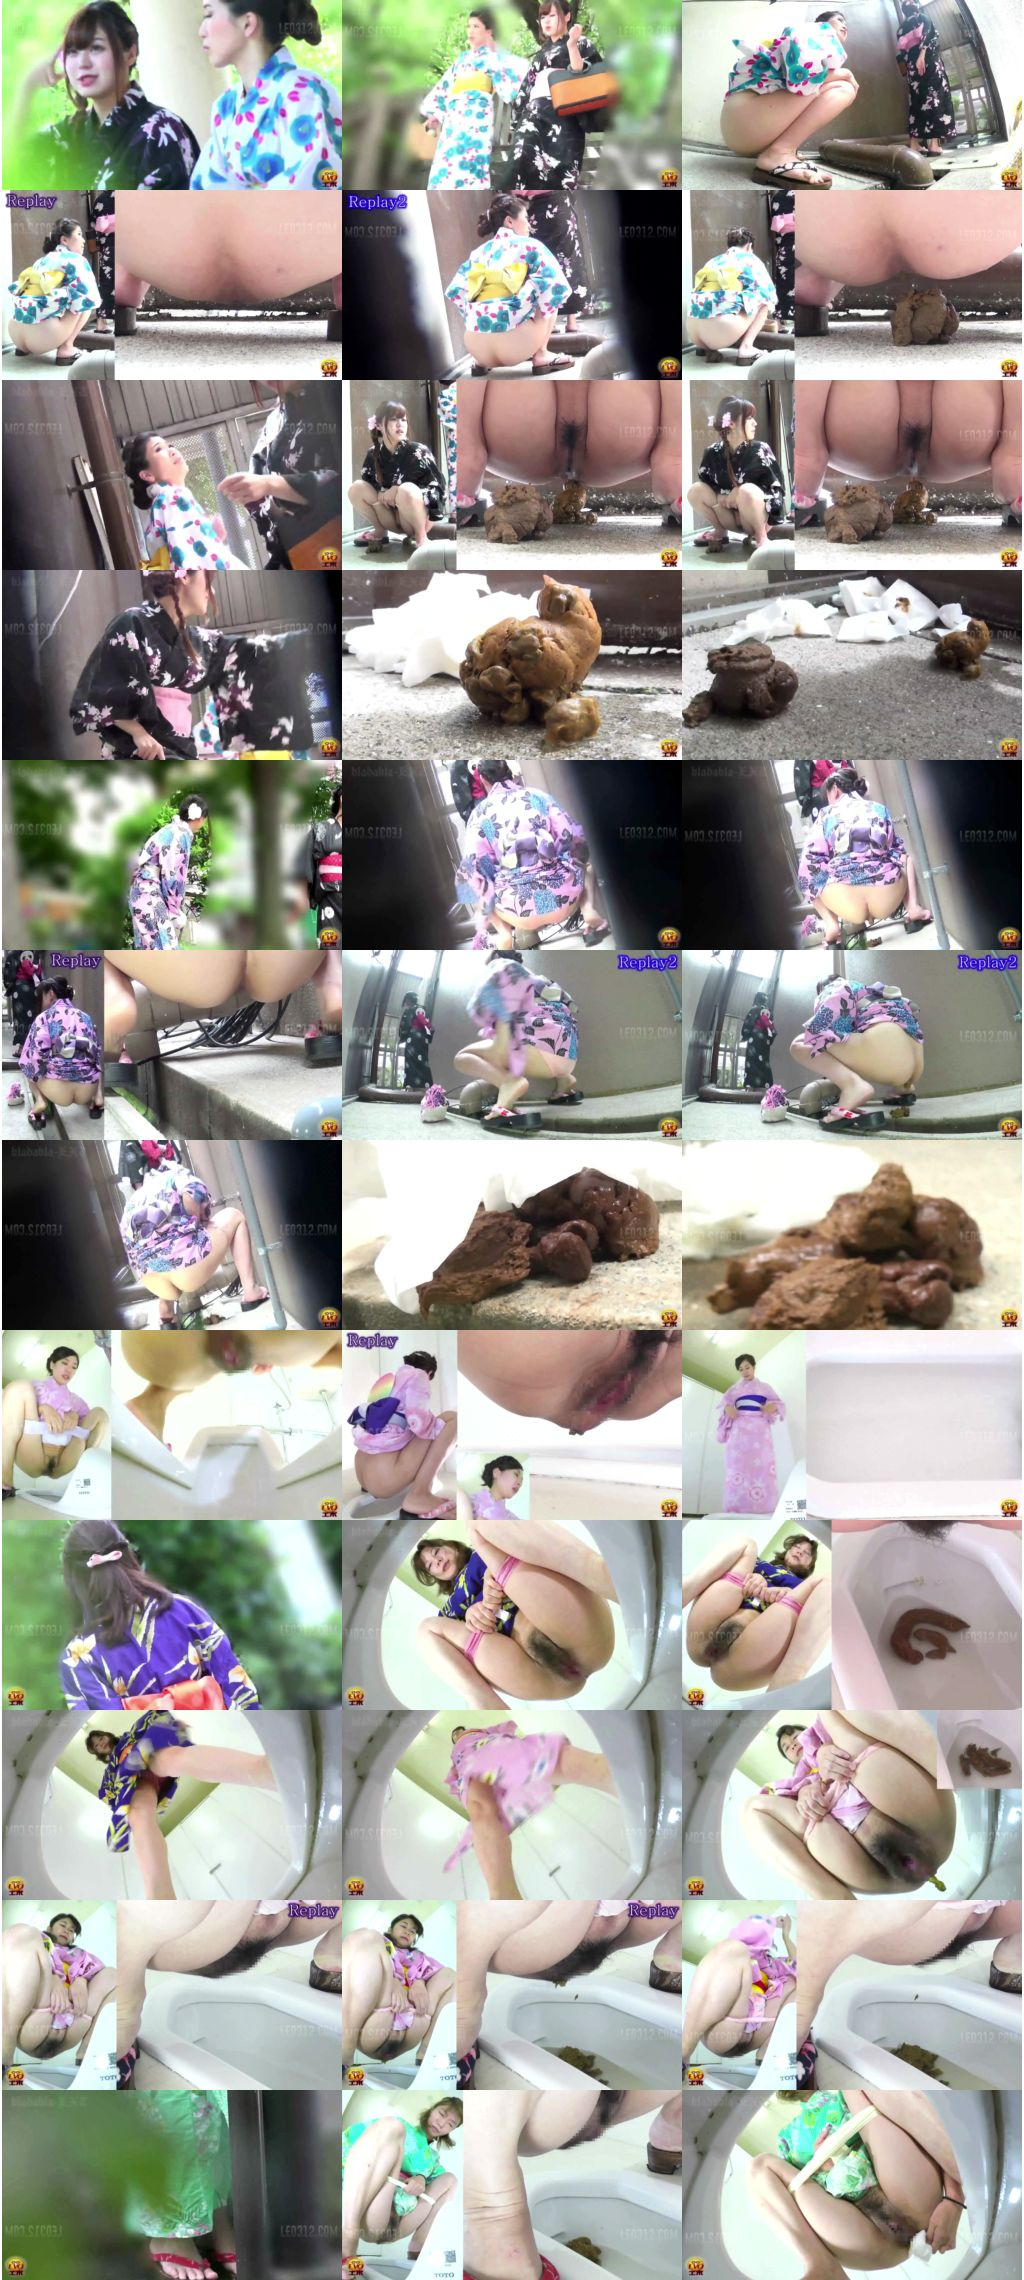 [EE-243] 追跡撮 浴衣美人 緊急うんこ Evo Visual  Kimono Jade 脱糞 スカトロ